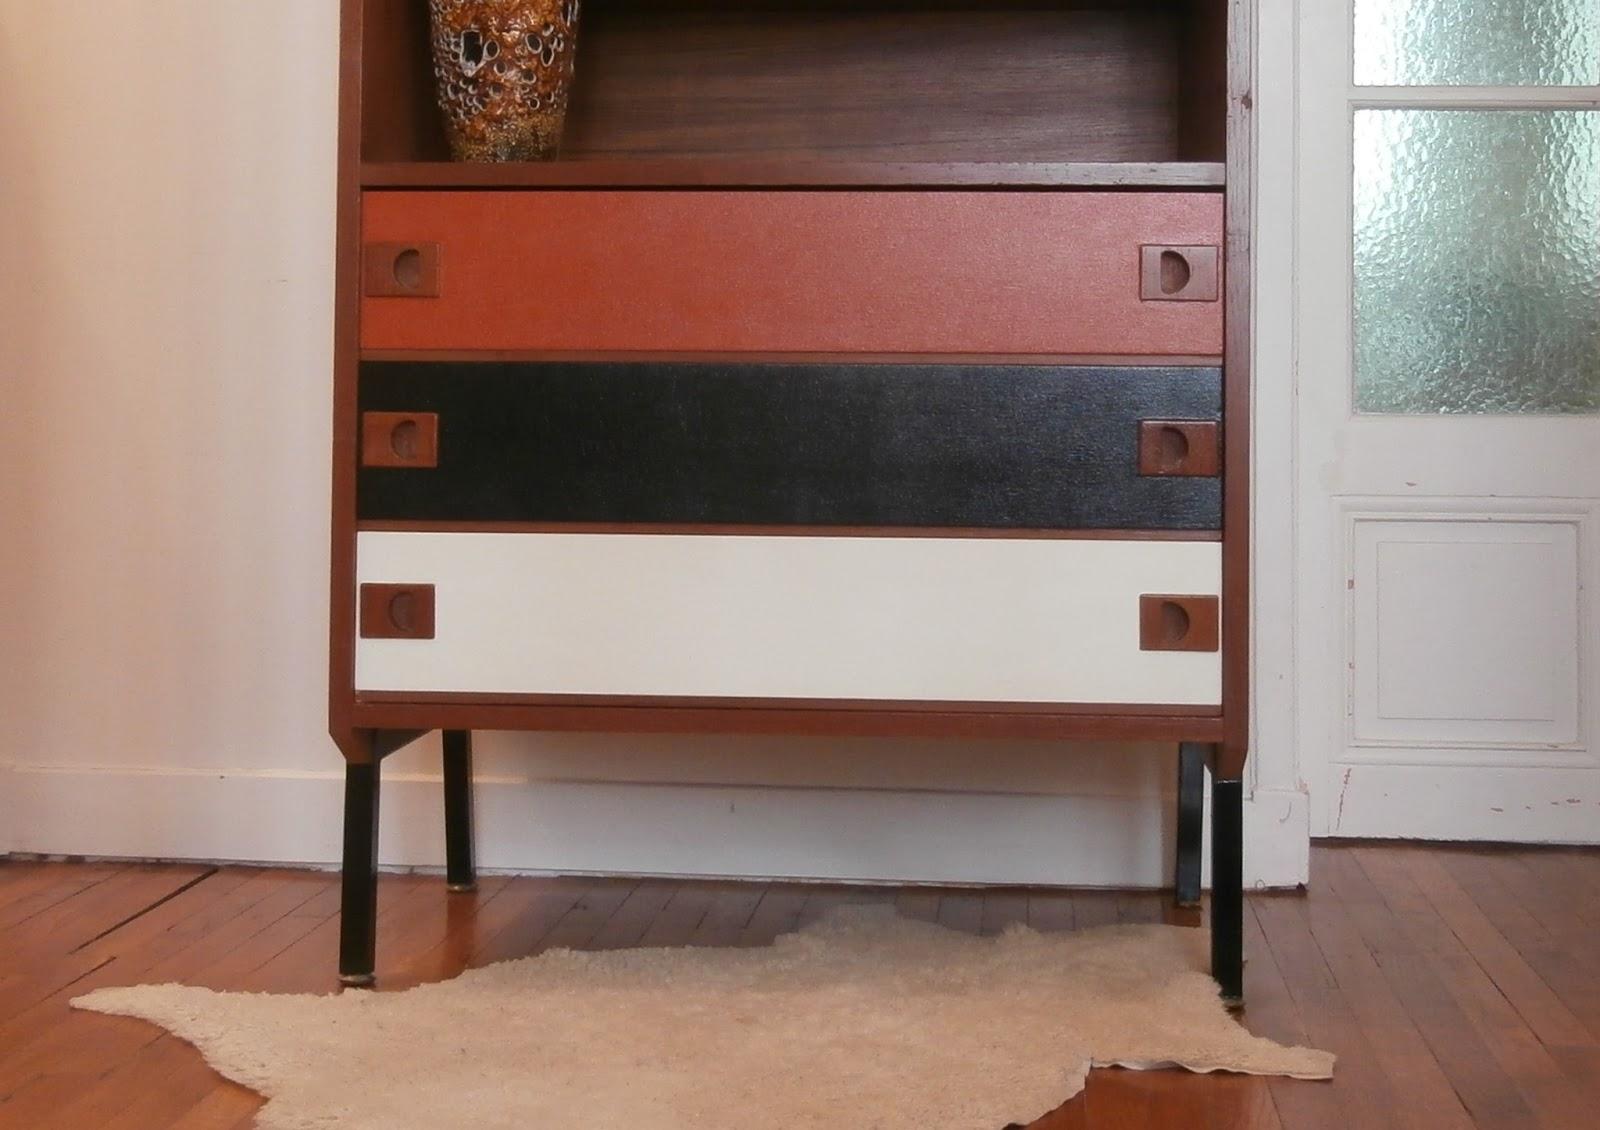 dur e de vie ind termin e meuble en teck ann es 50 60. Black Bedroom Furniture Sets. Home Design Ideas